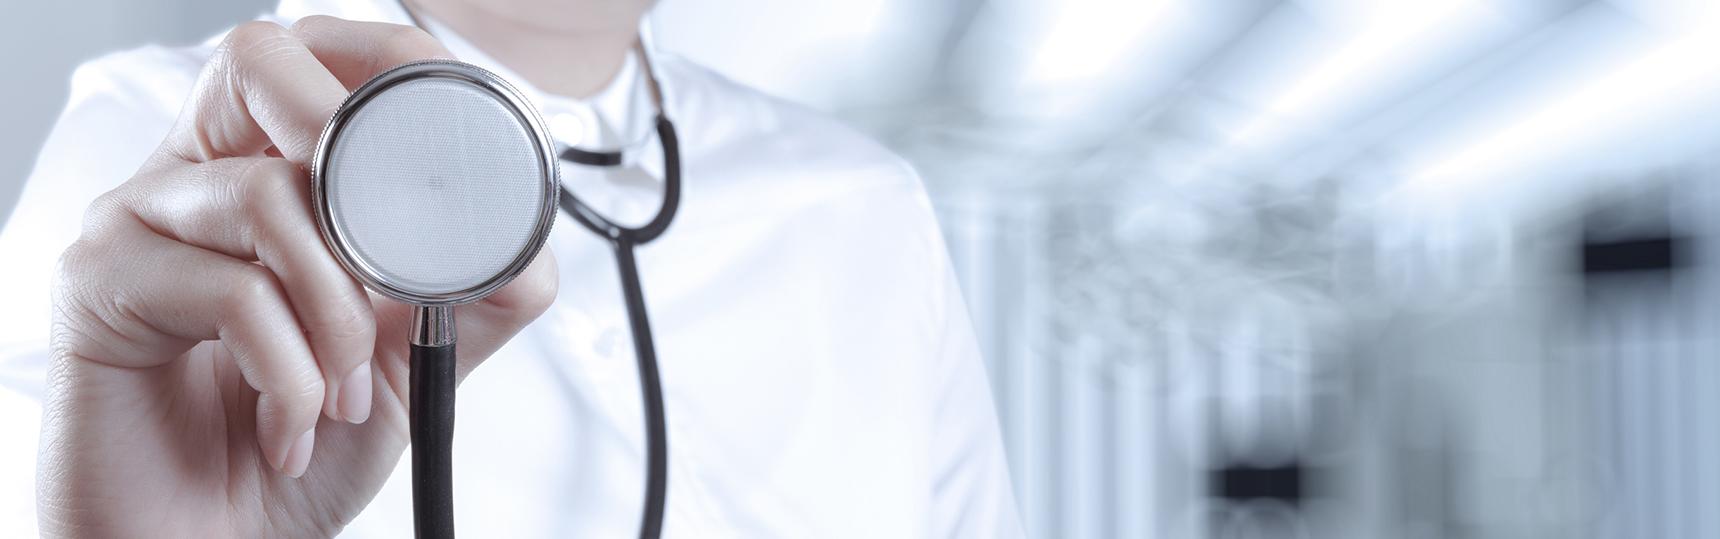 vente materiel medical professionnel